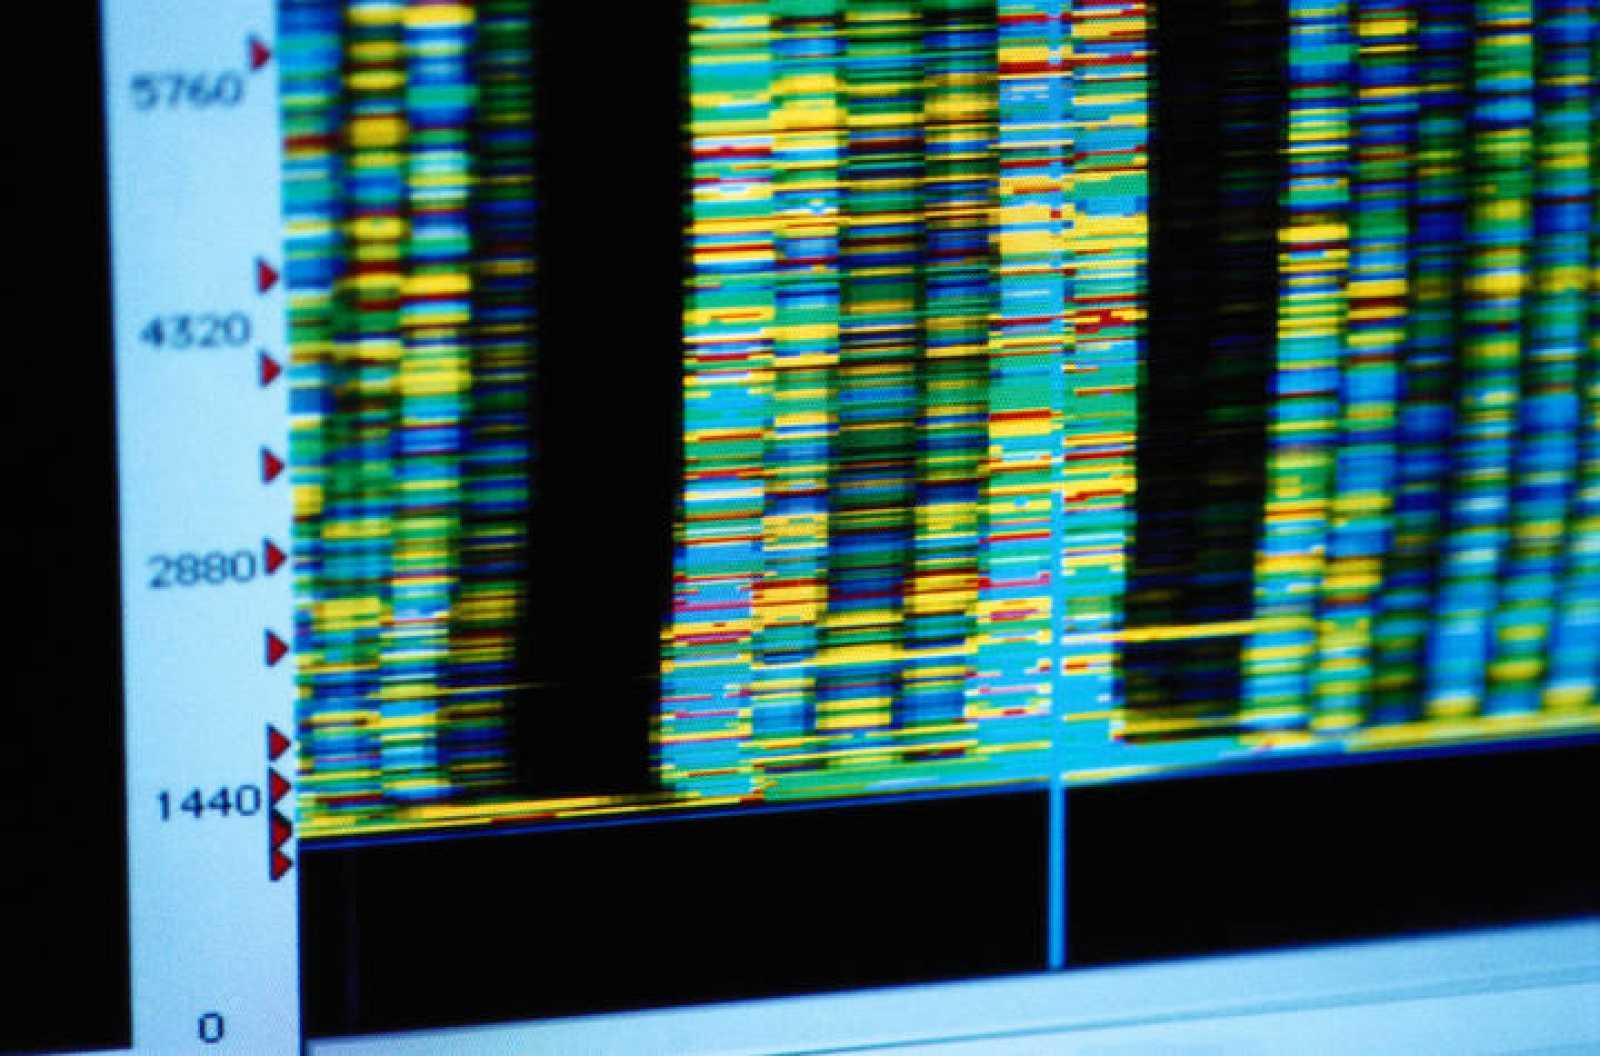 Pantalla mostrando diferentes configuraciones de ADN.